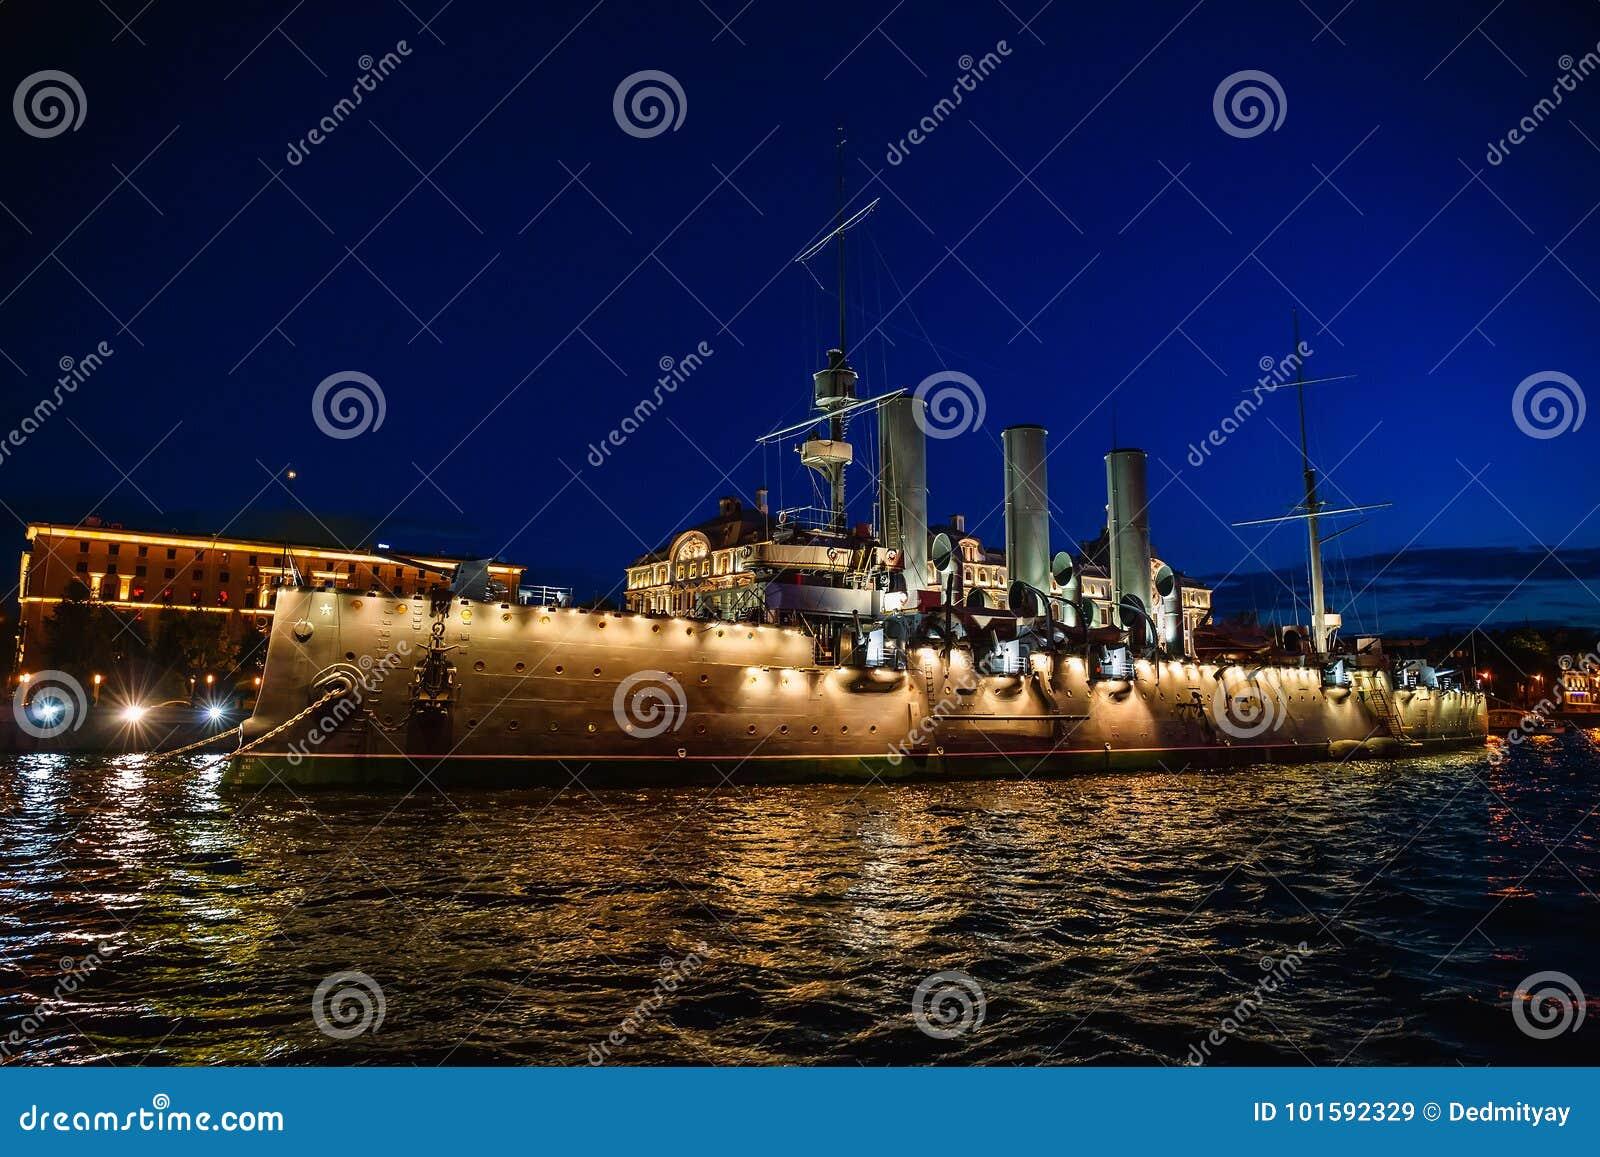 Russian cruiser Aurora or Avrora cruiser in Saint-Petersburg, Russia. Museum ship in St. Petersburg, view from river